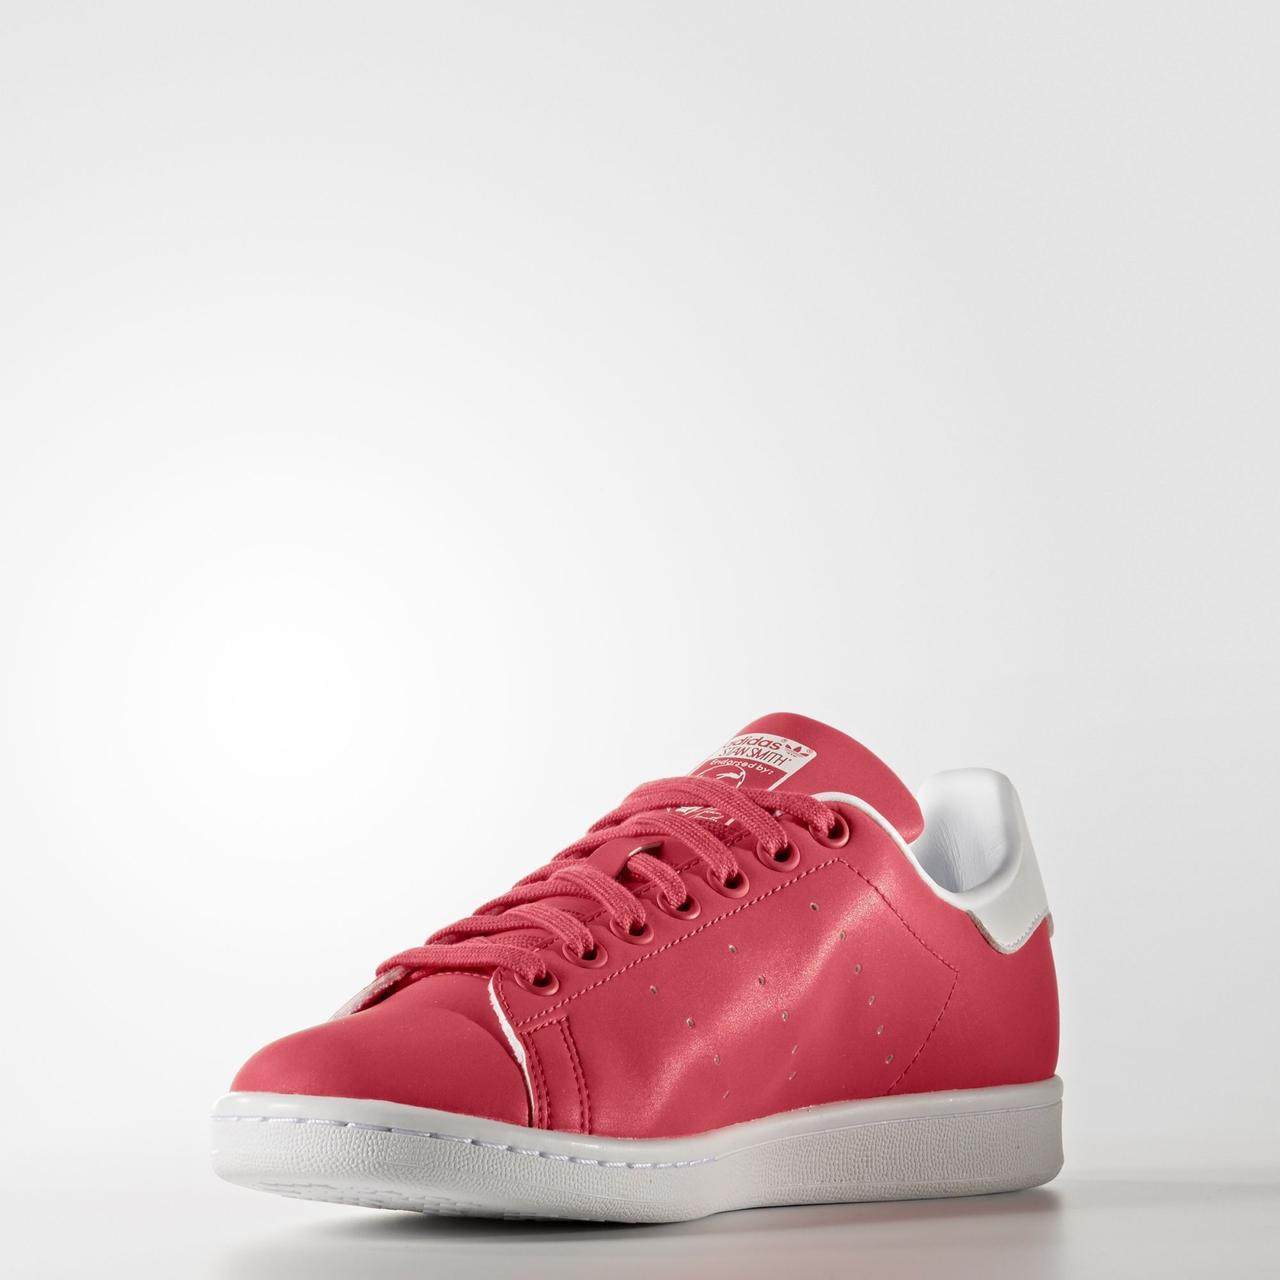 843231adf6dc Кроссовки женские Adidas Stan Smith W BB5154 - Popsport.com.ua ‒ интернет-